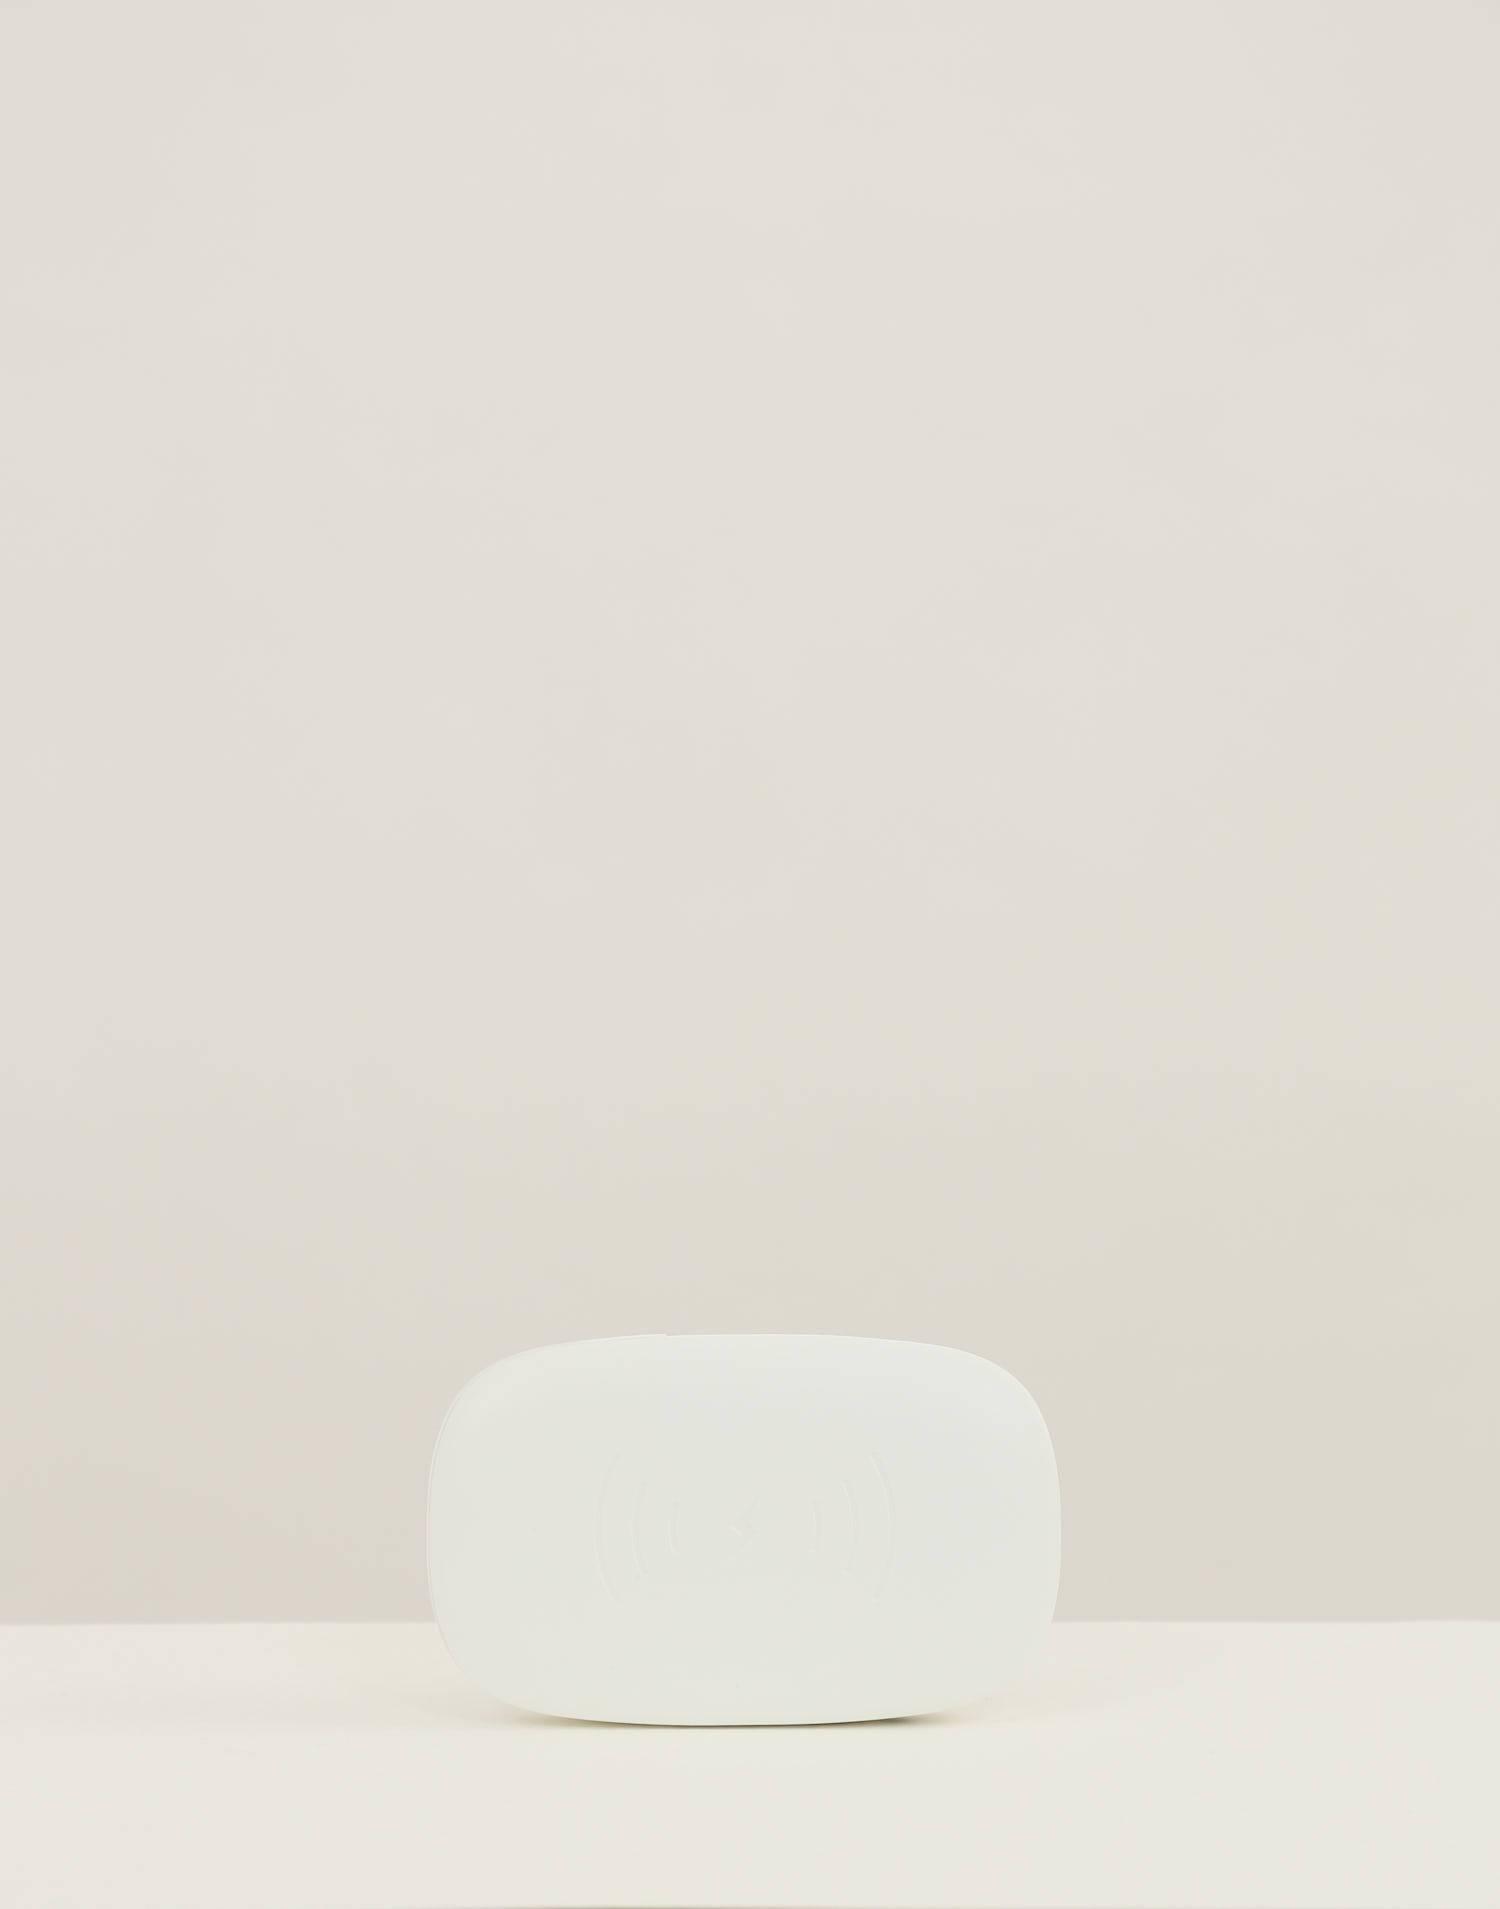 Uv phone sanitizer and wireless charging hub